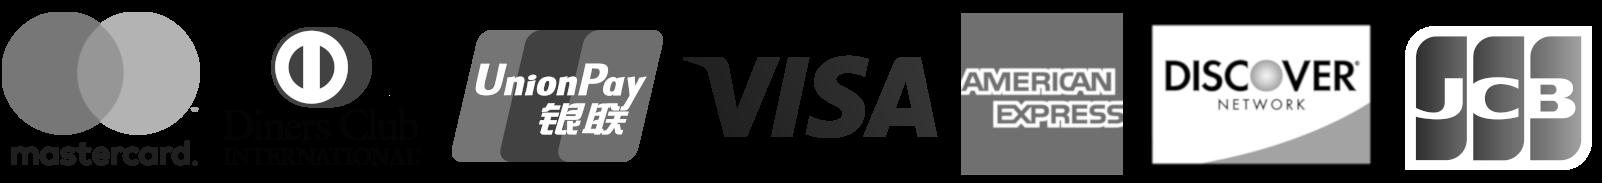 Credit Card Logos: Visa, MasterCard, UnionPay